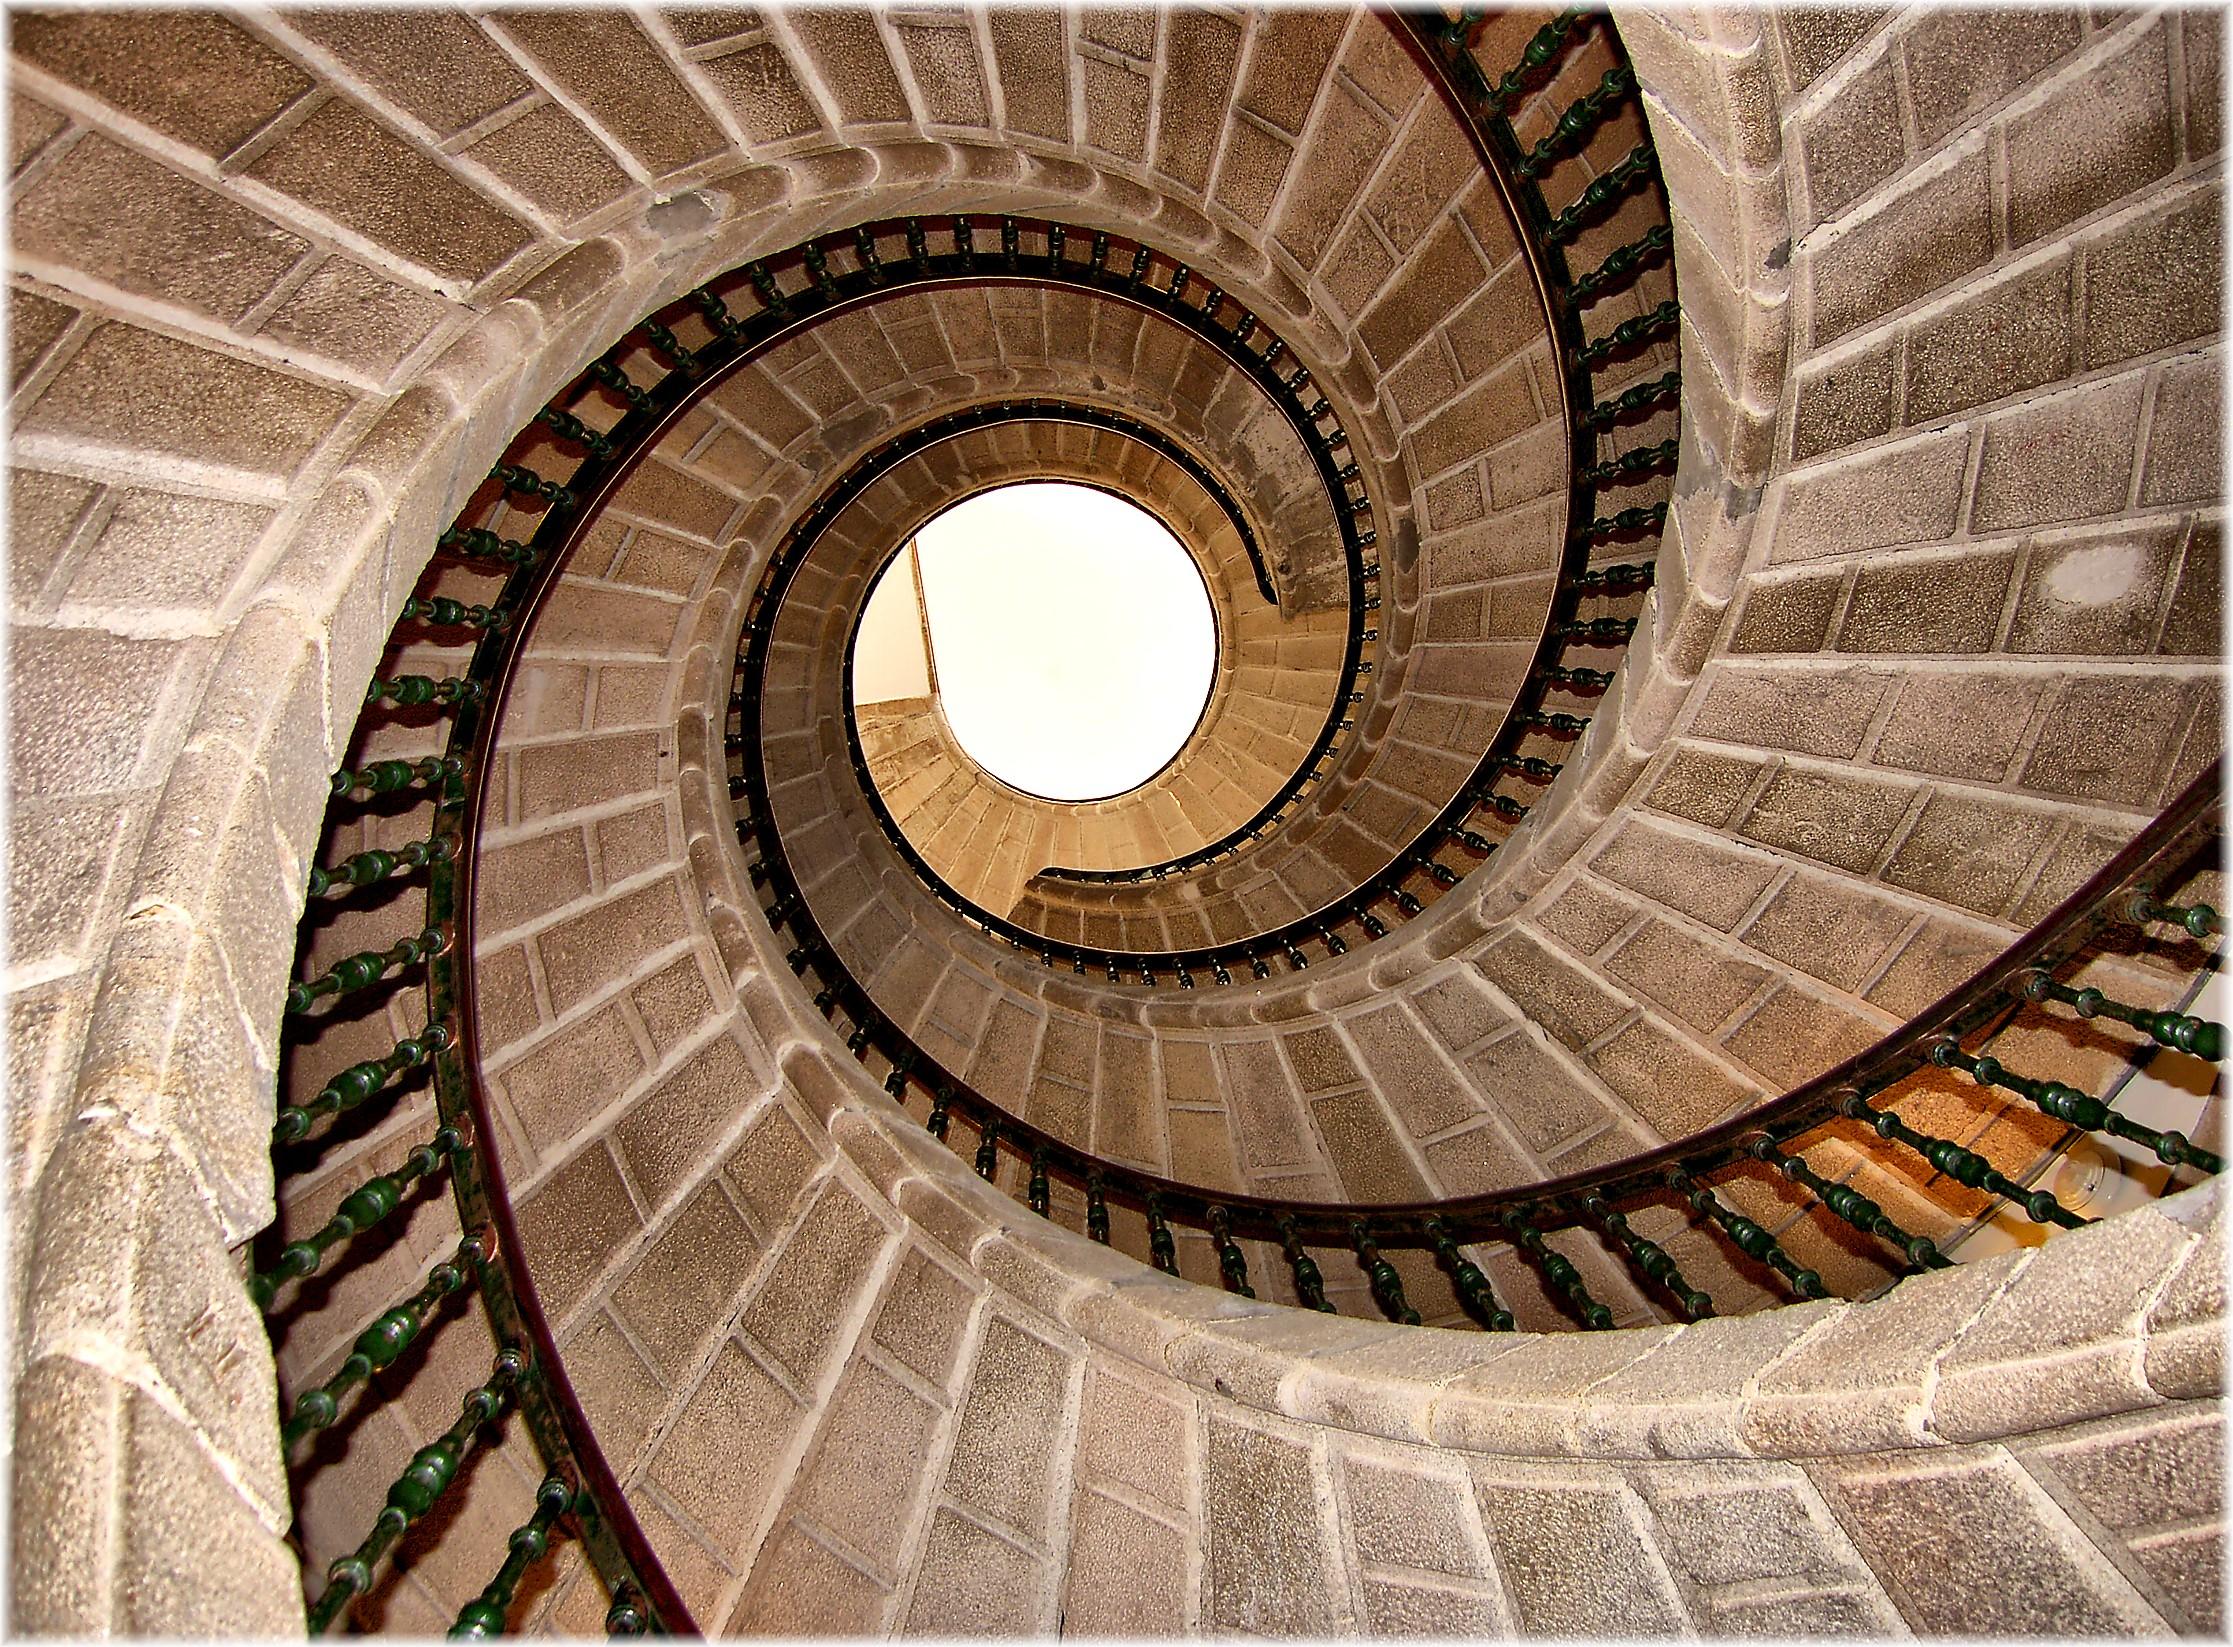 Fotos gratis arquitectura estructura madera espiral pared europa arco l nea ladrillo - Escaleras de caracol economicas ...